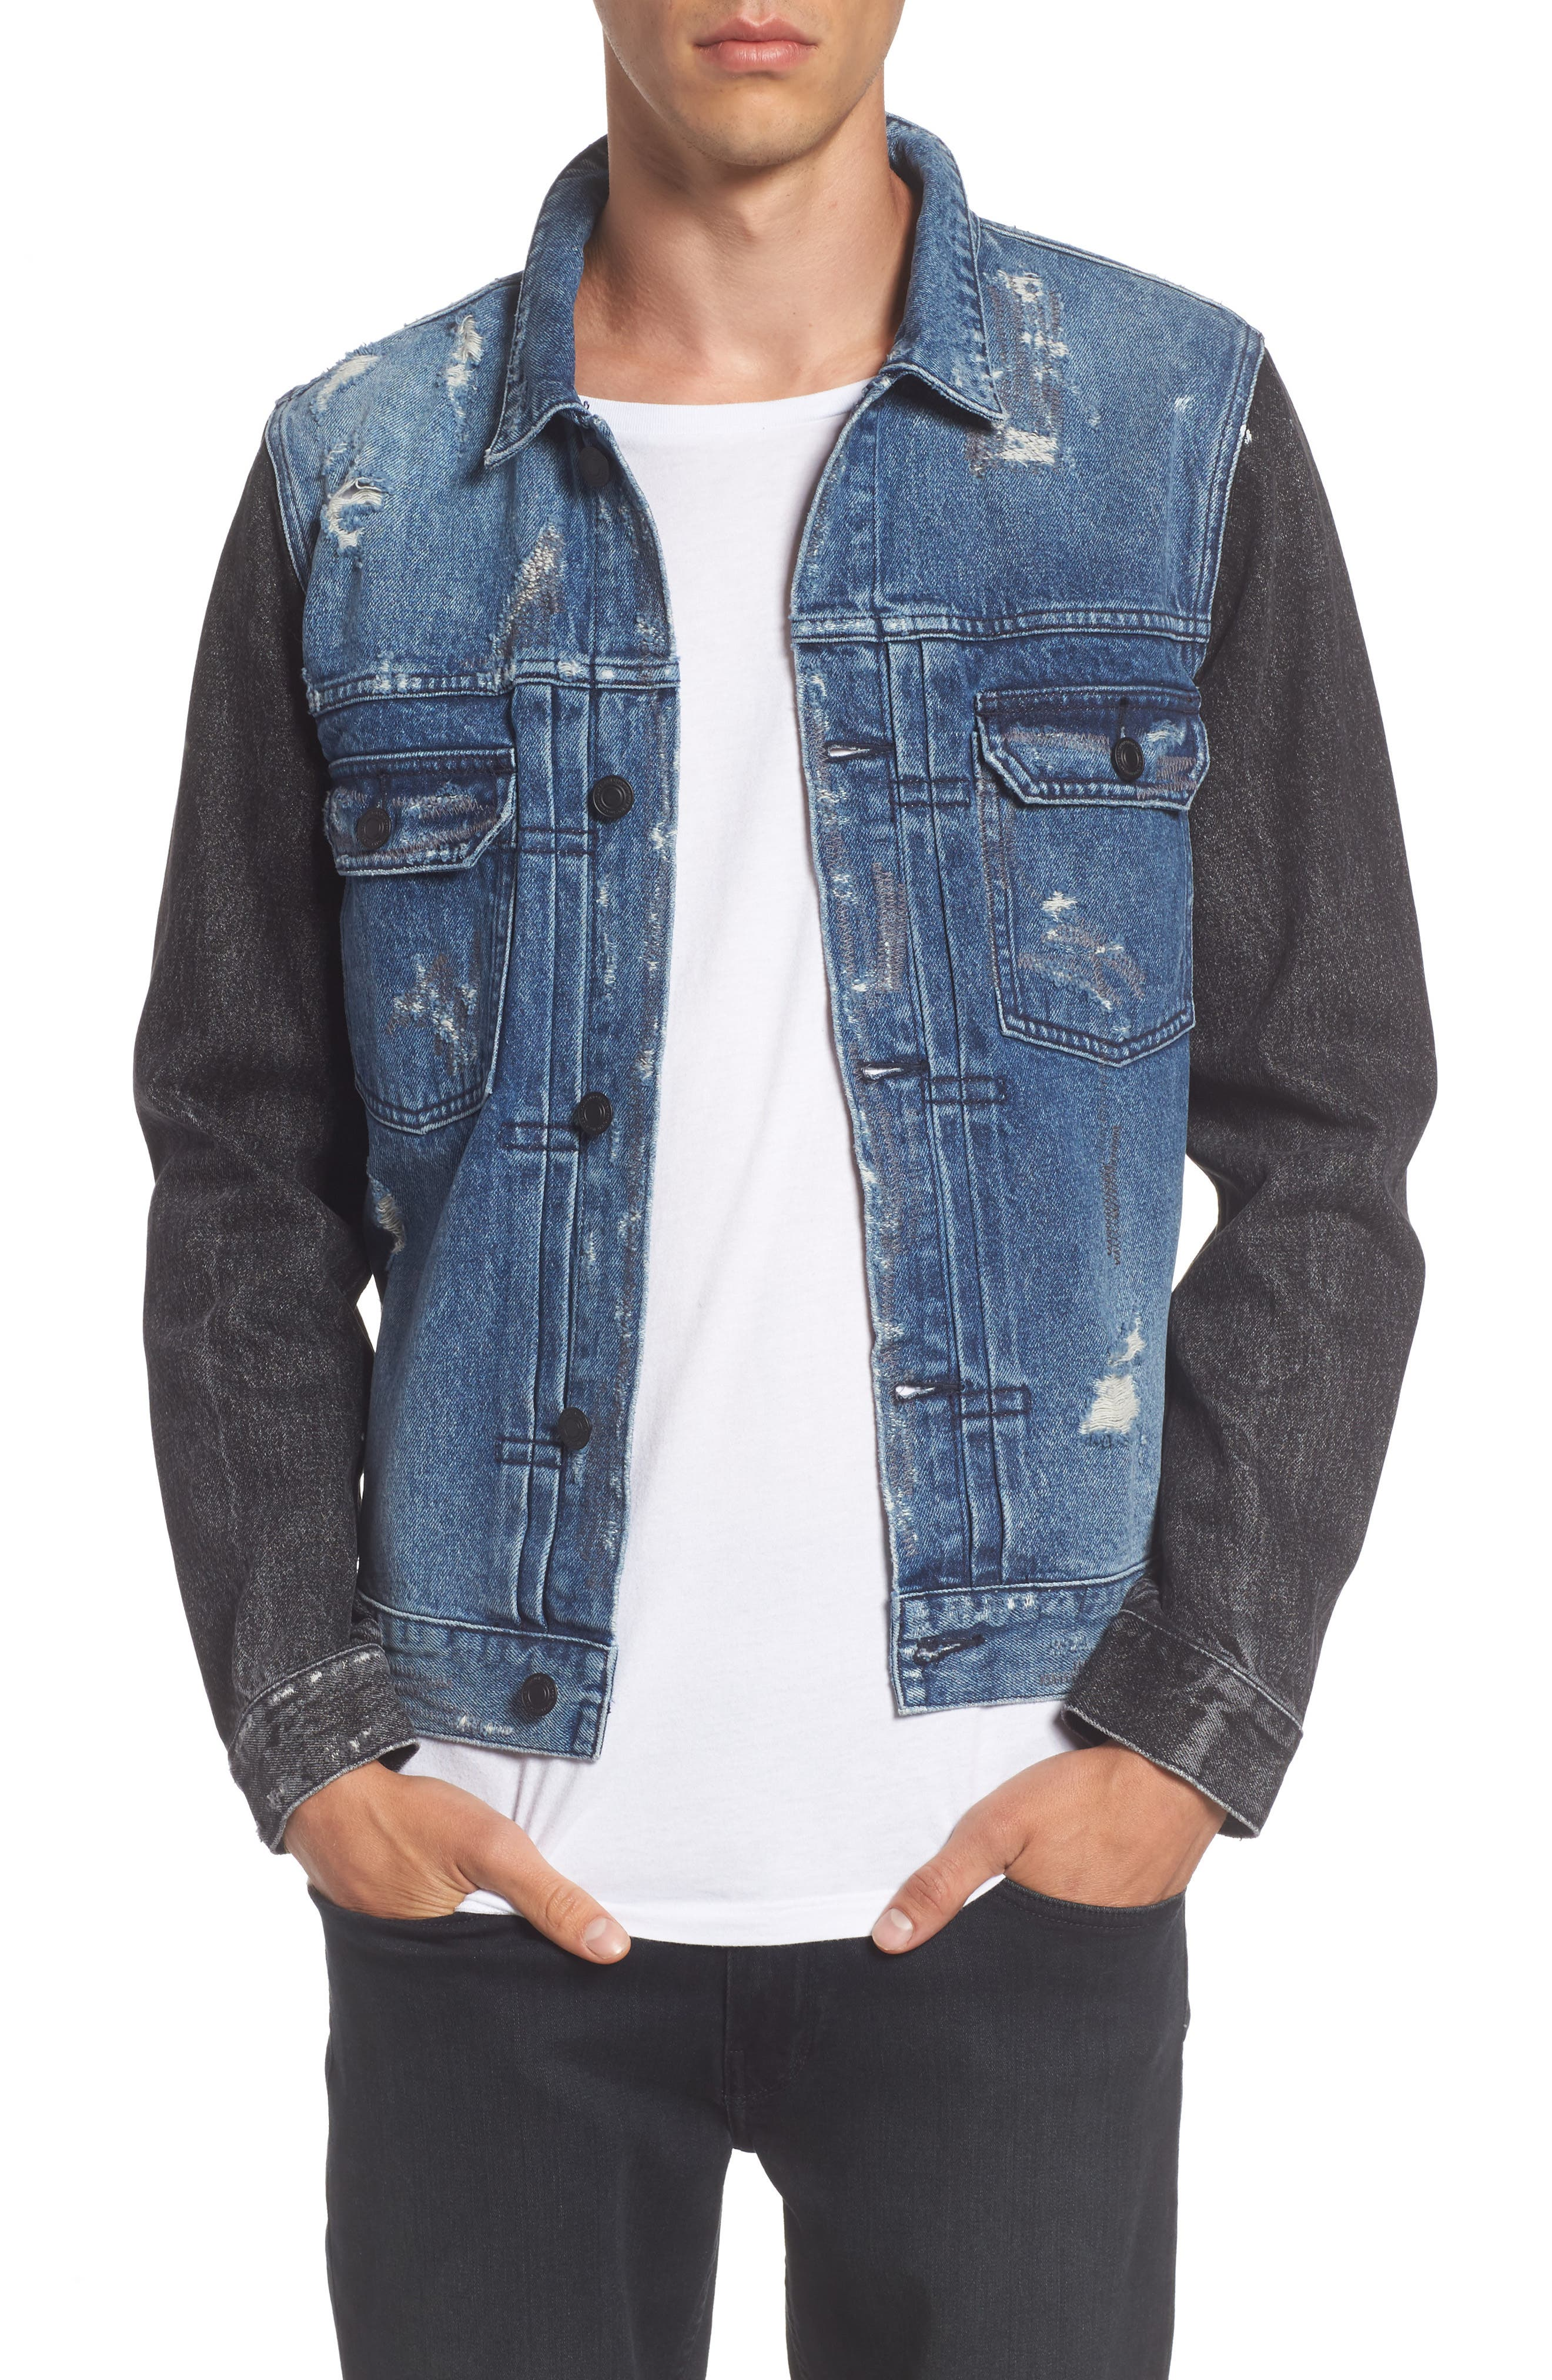 Trash Denim Jacket,                         Main,                         color, Metal